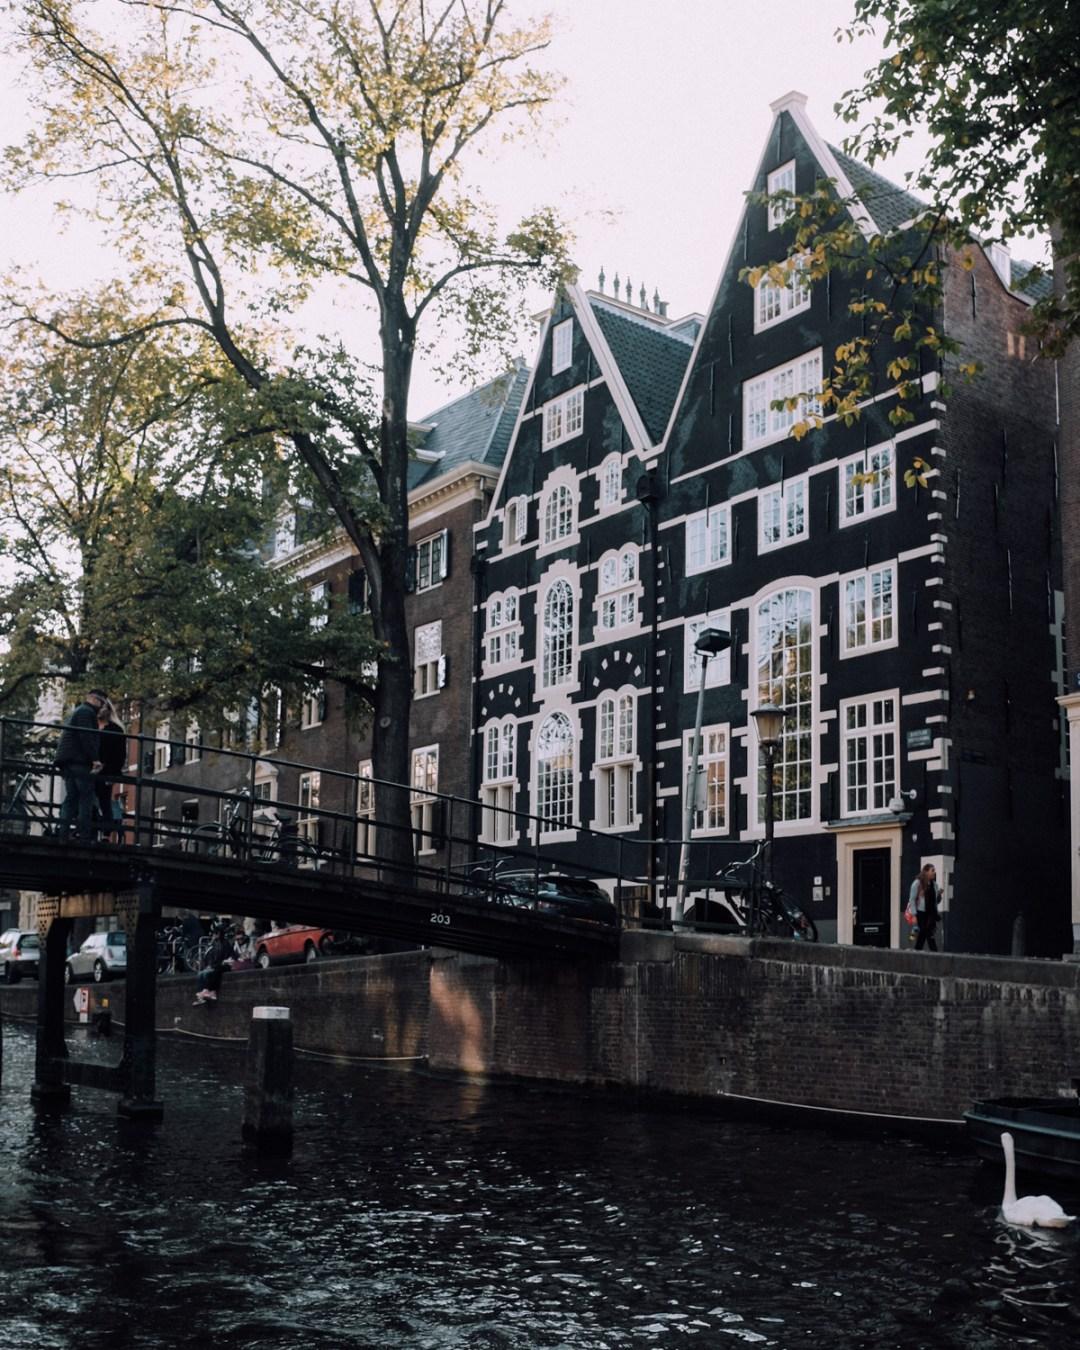 inastil, Ü50Blog, Amsterdam, Citytrip, Reiseblogger, Amsterdamtipps, Städtereise, Ü50Reiseblogger, Herbst in Amstrdam-24